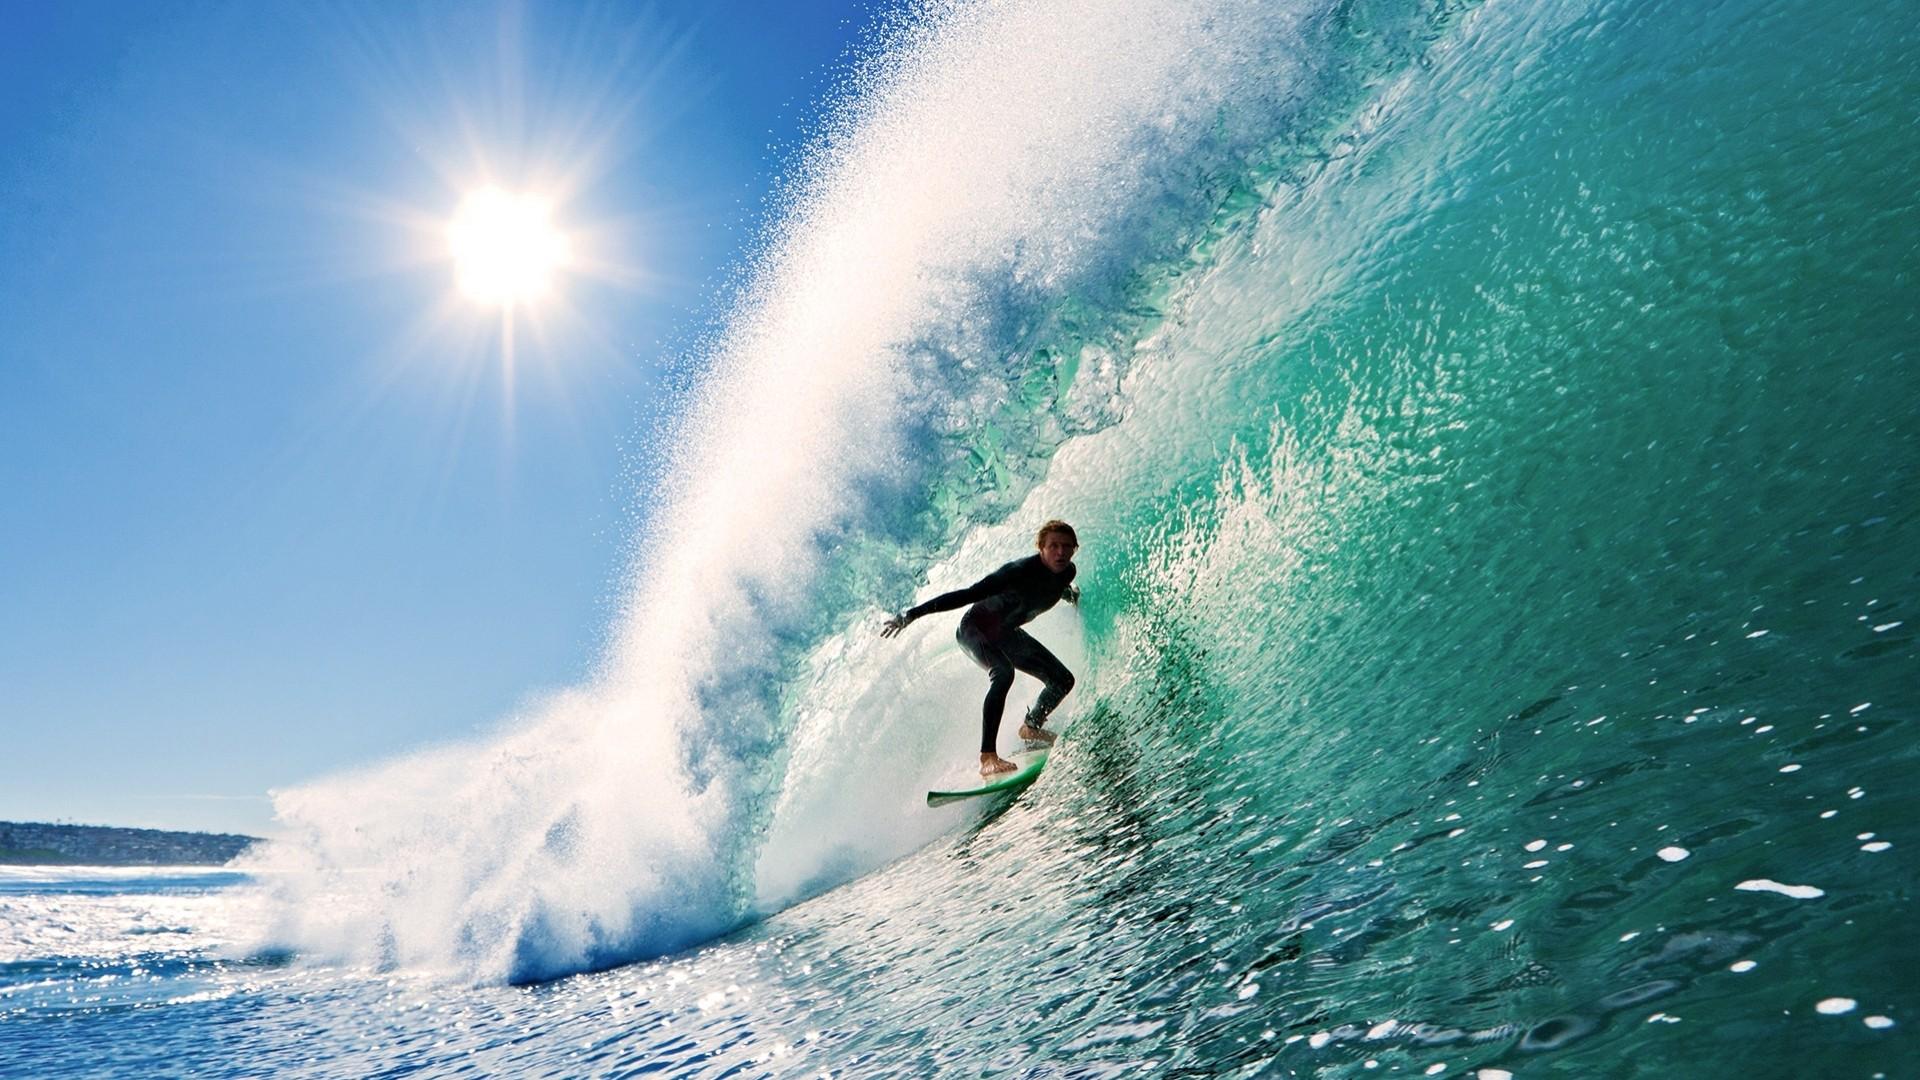 спорт серфинг природа море вечер sports surfing nature sea evening онлайн